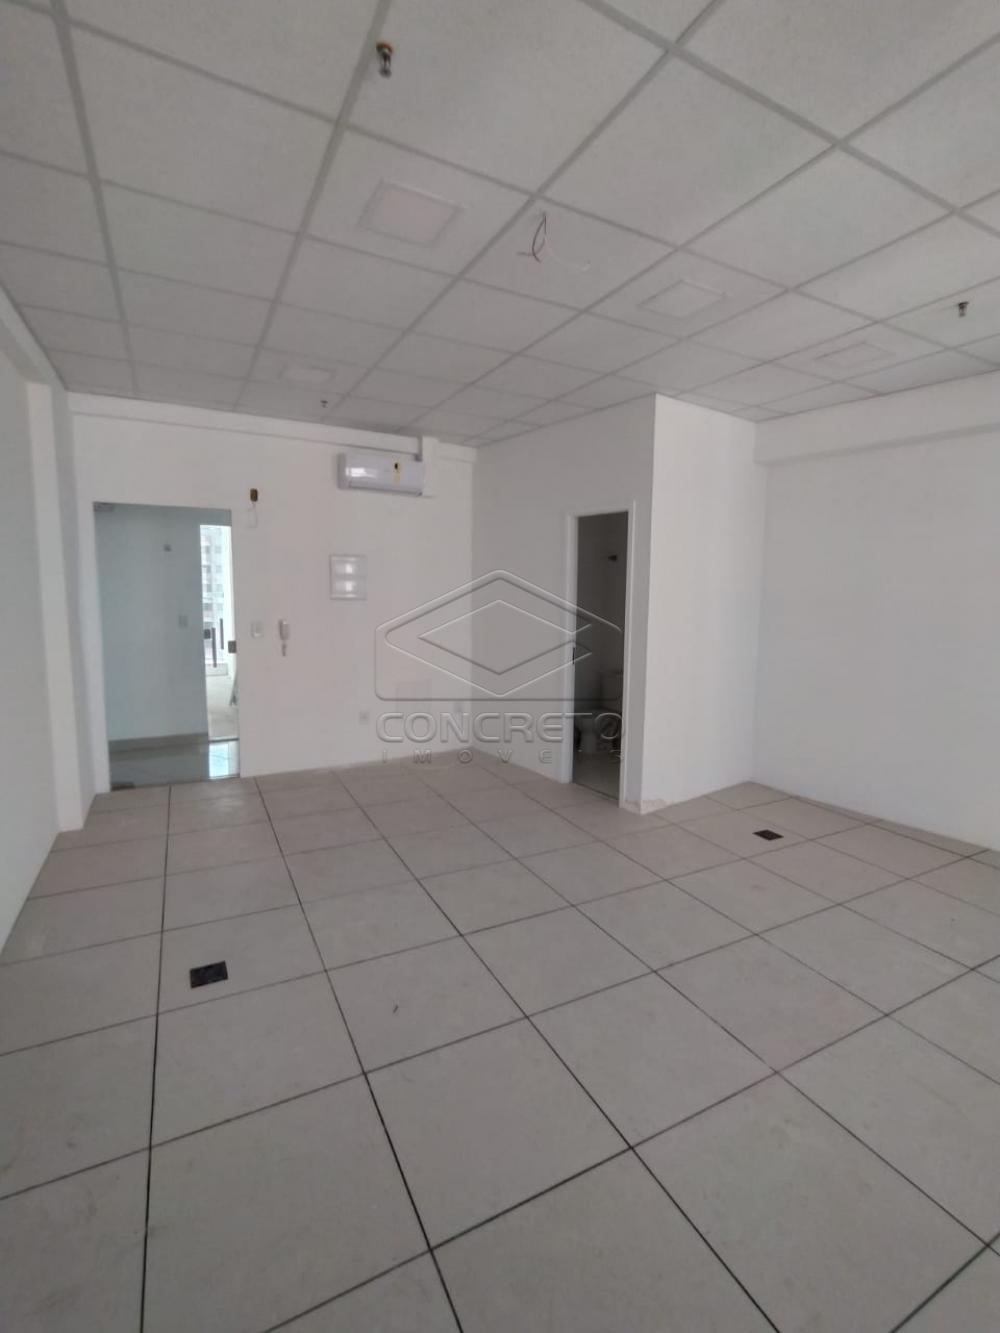 Alugar Comercial / Sala em Bauru apenas R$ 1.300,00 - Foto 5